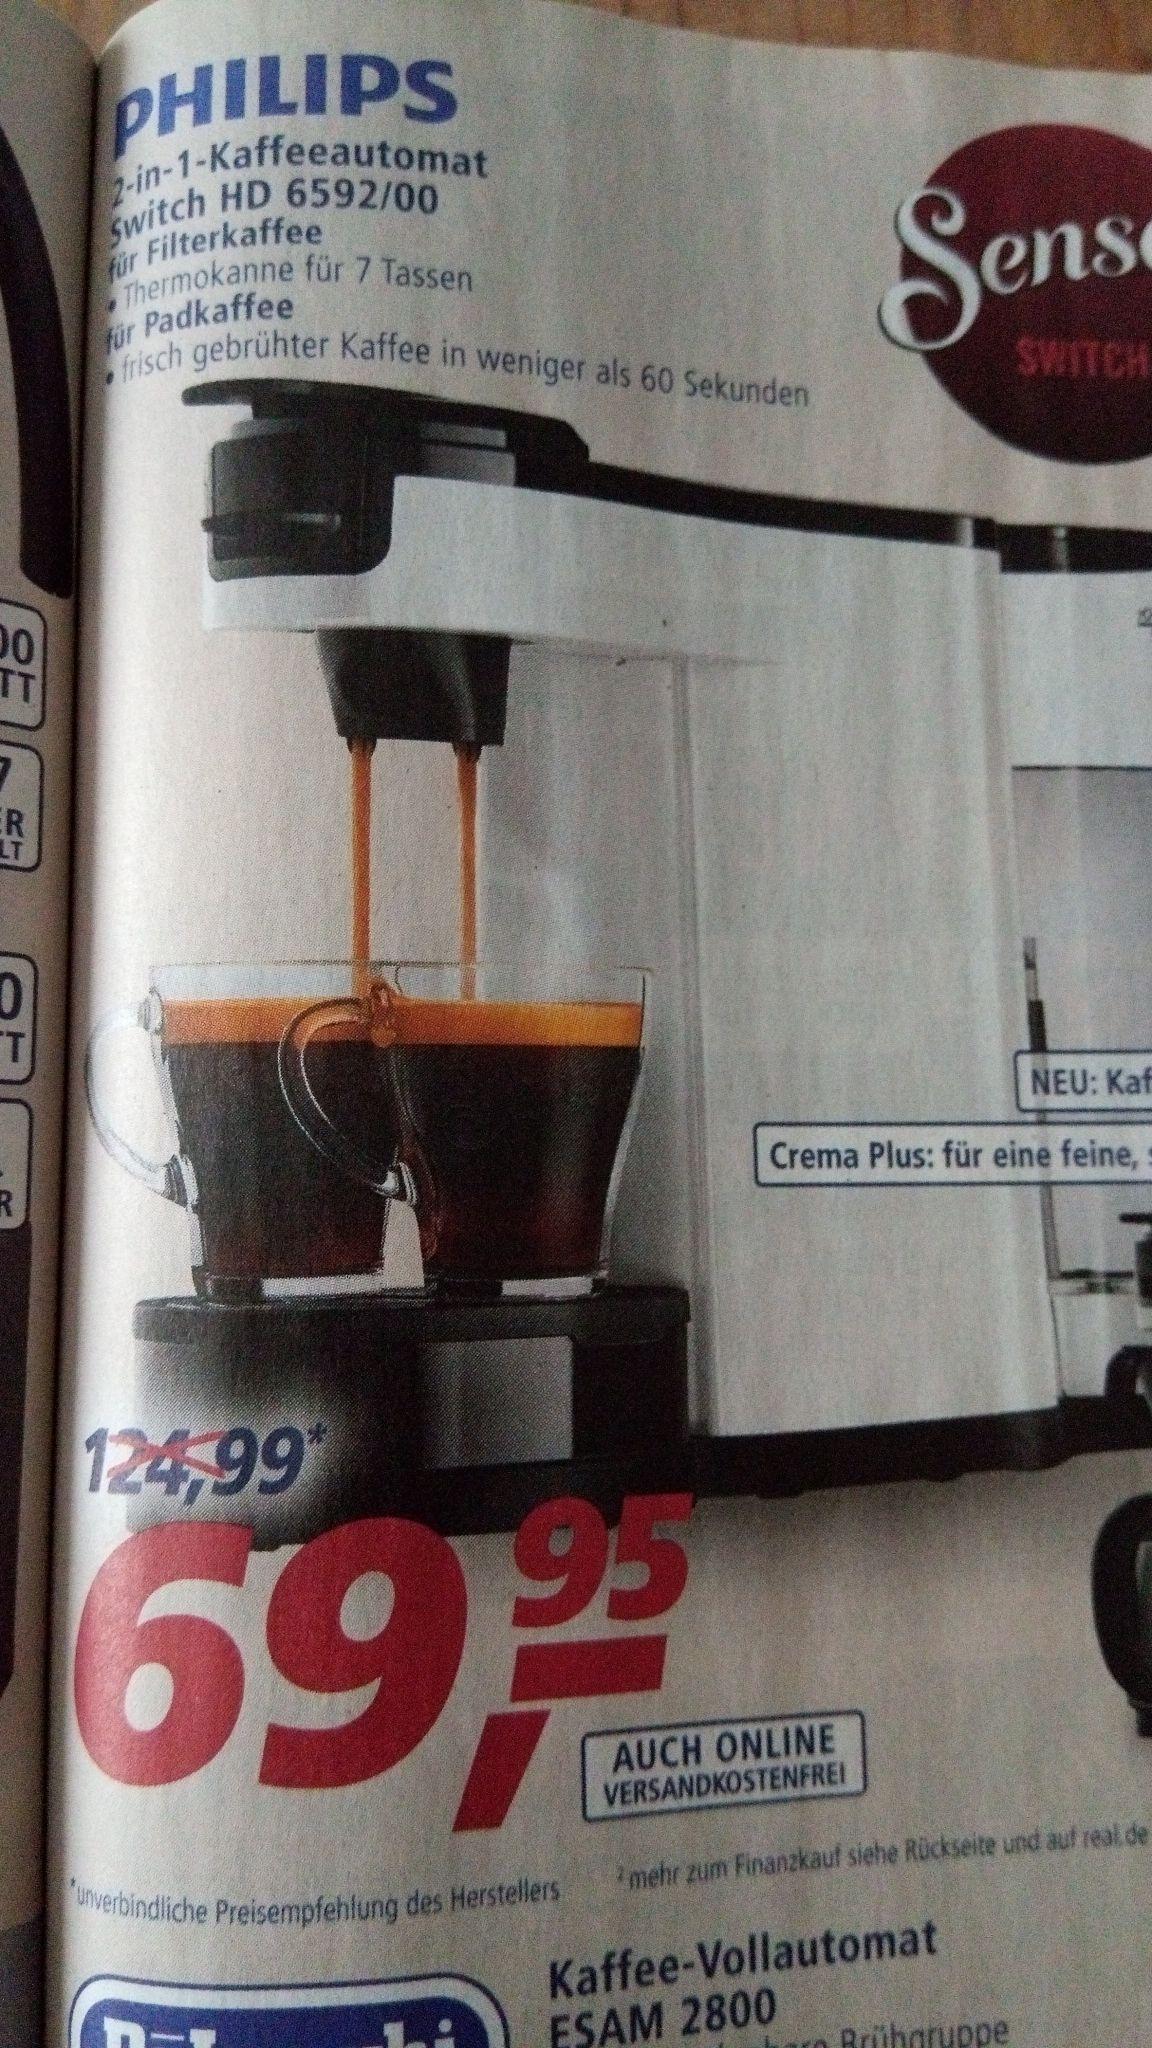 Real Senseo Switch HD 6592/00